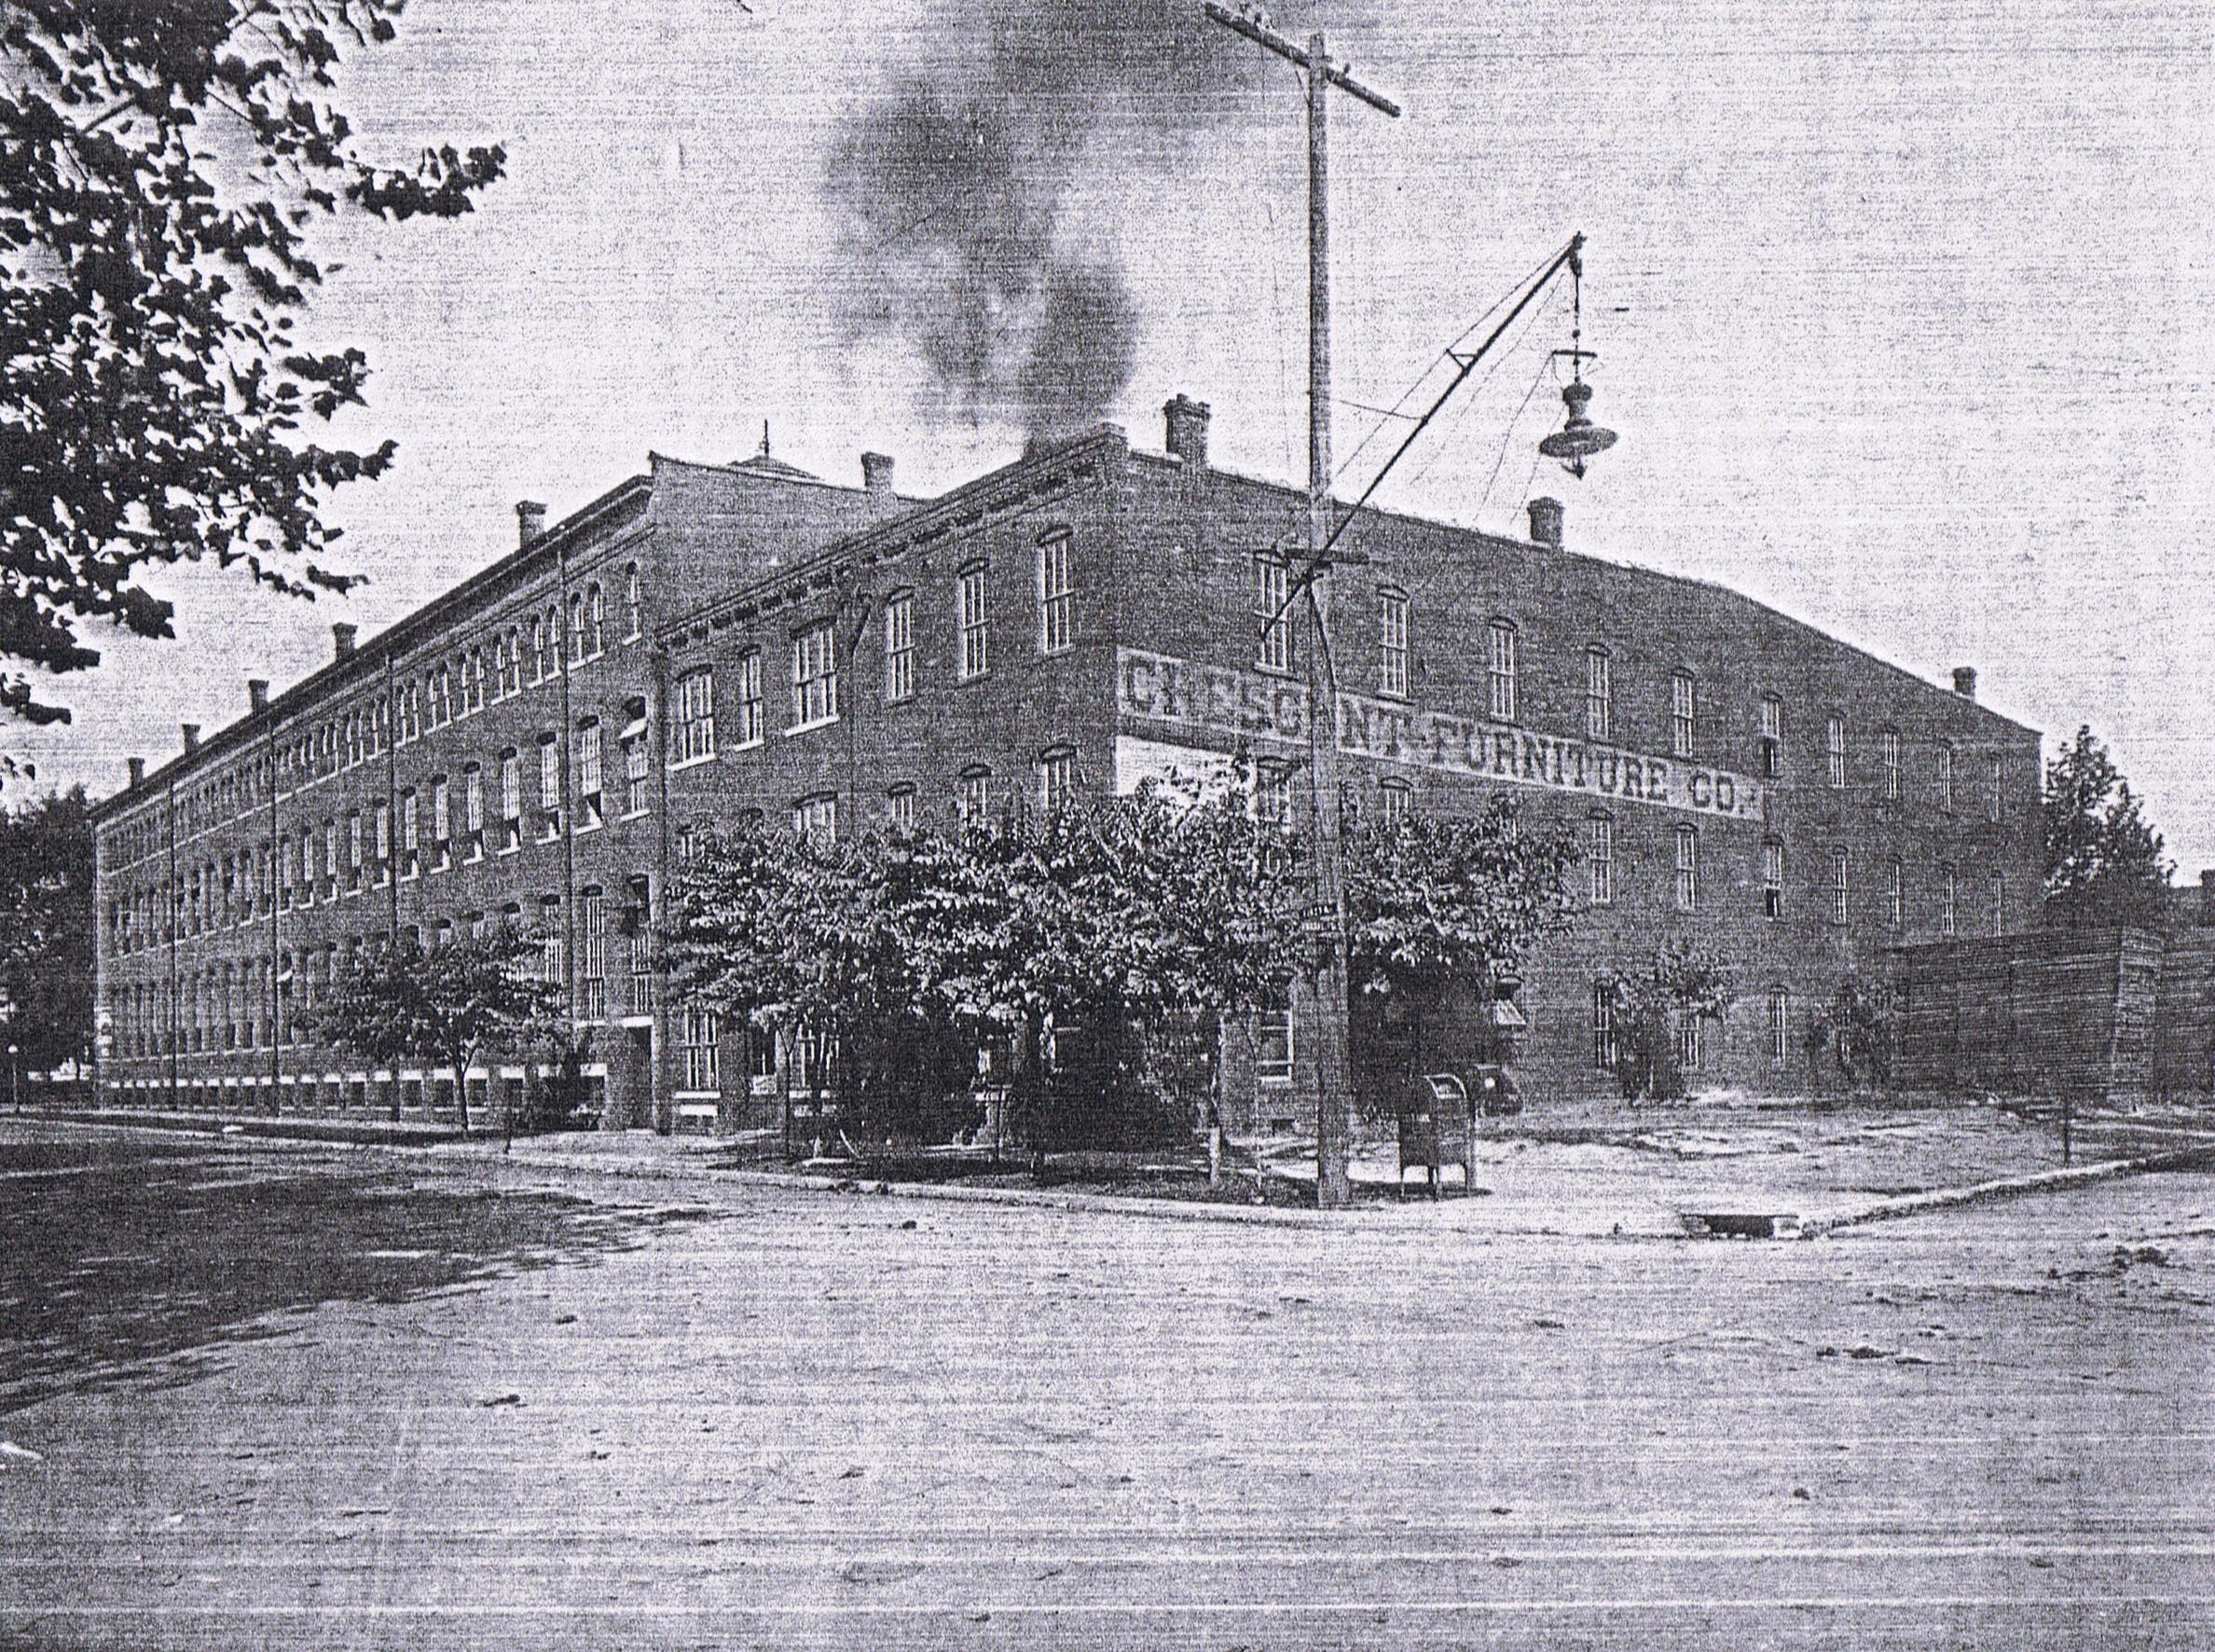 Crescent Furniture Factory